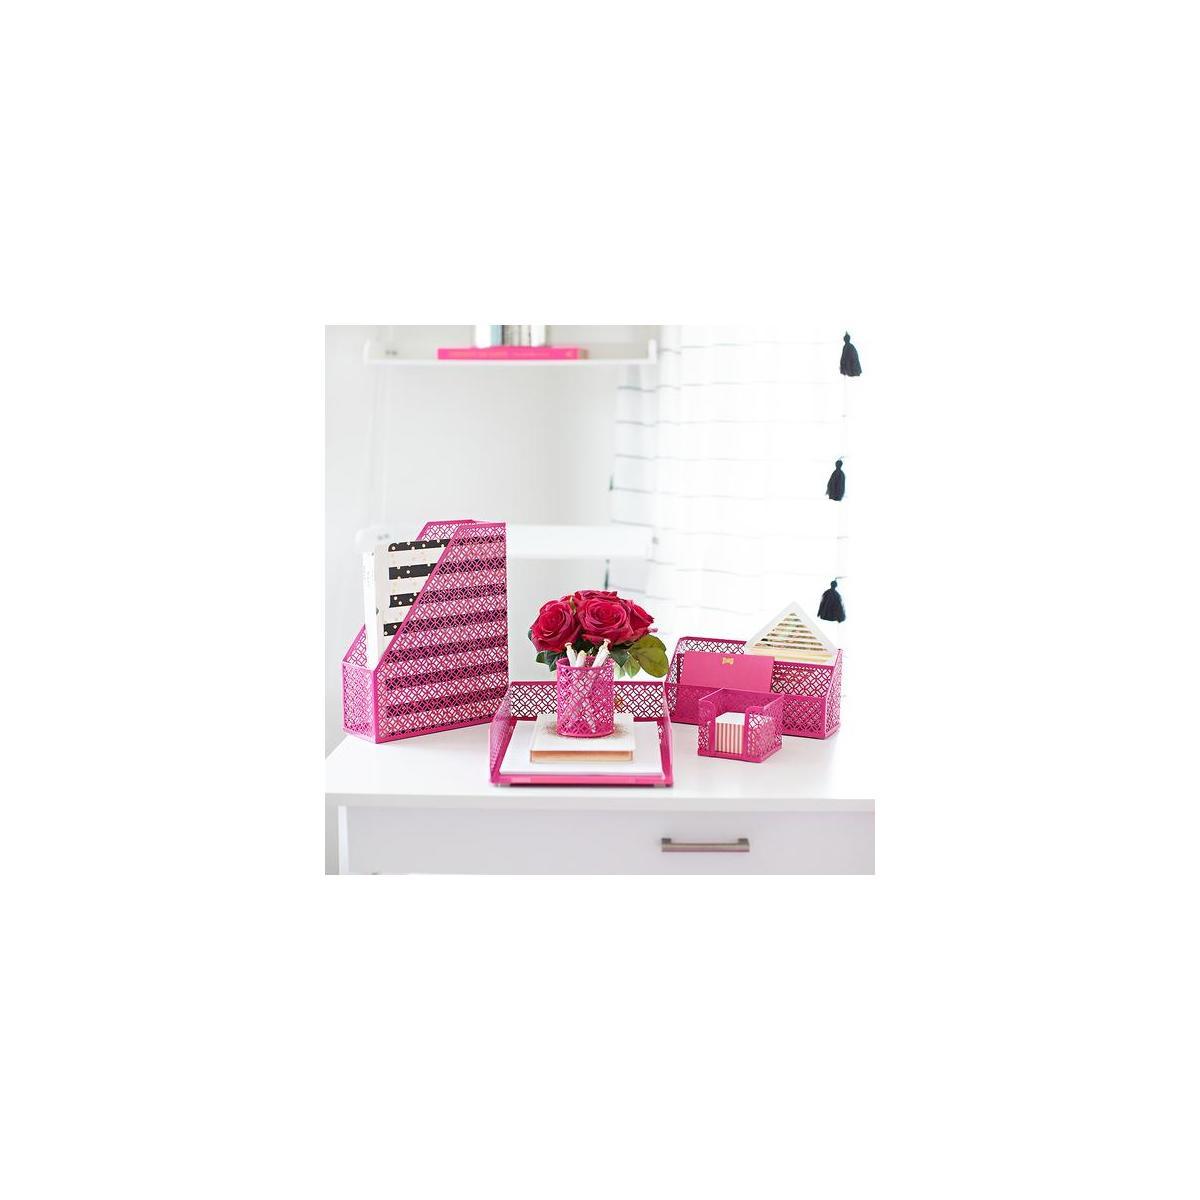 Blu Monaco Pink Office Supplies Hot Pink Desk Accessories for Women Office  - 34 Piece Cute Desk Organizer Set